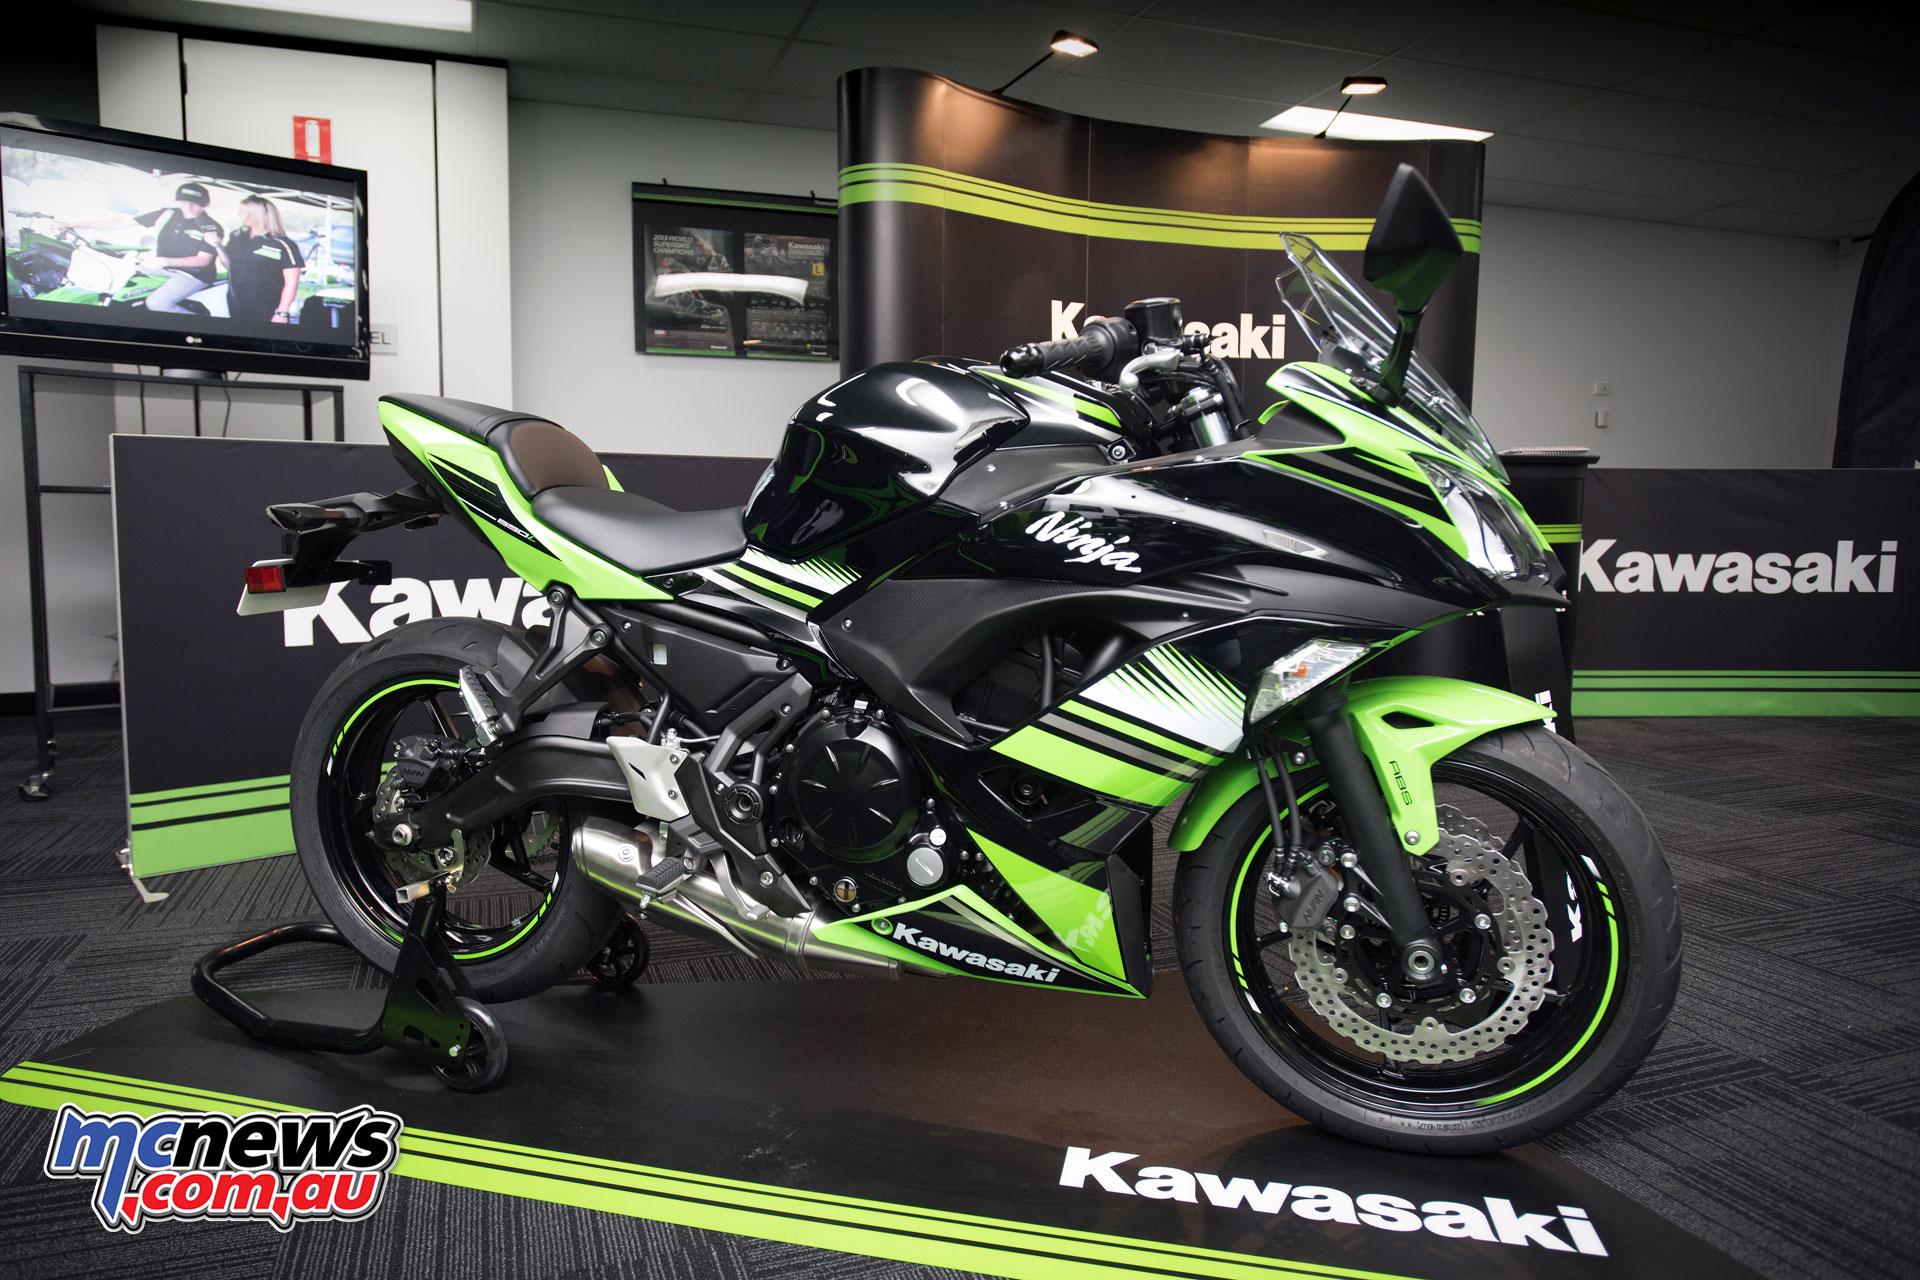 Kawasakis 2017 Z650 Ninja 650 Lams Review Mcnewscomau